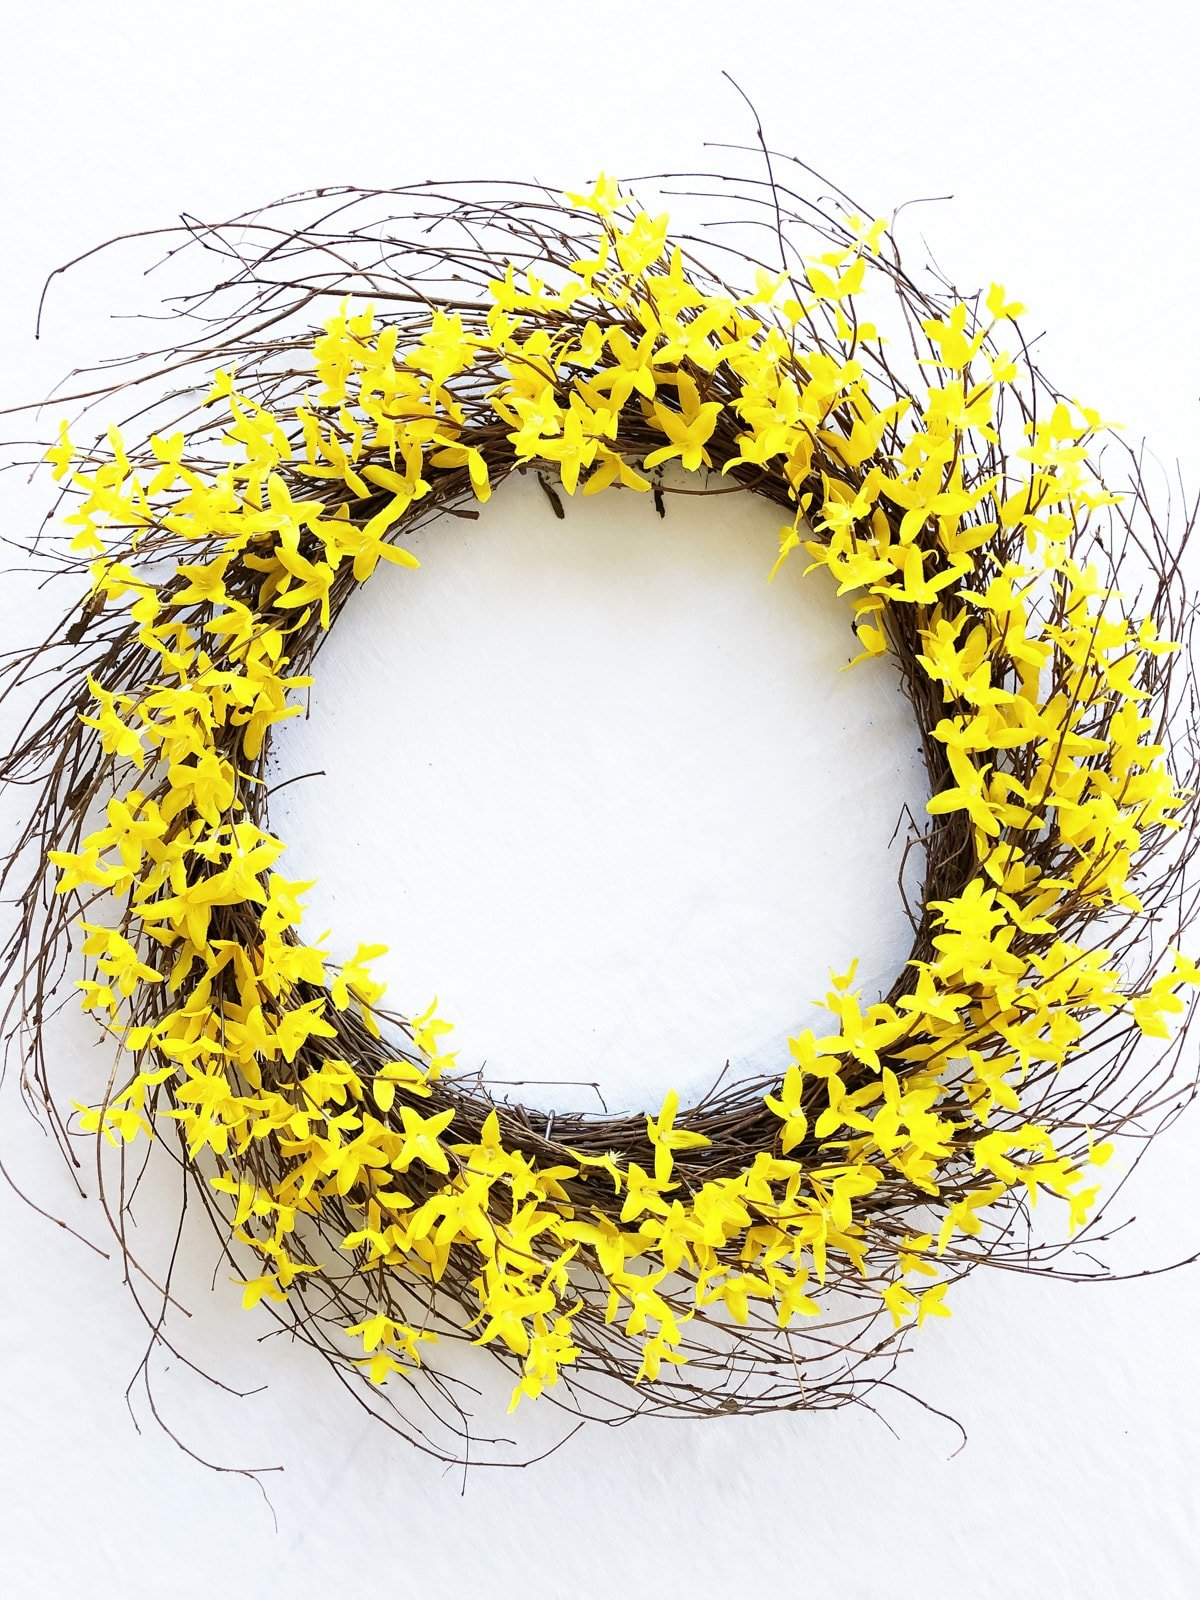 How to Make a Forsythia Wreath